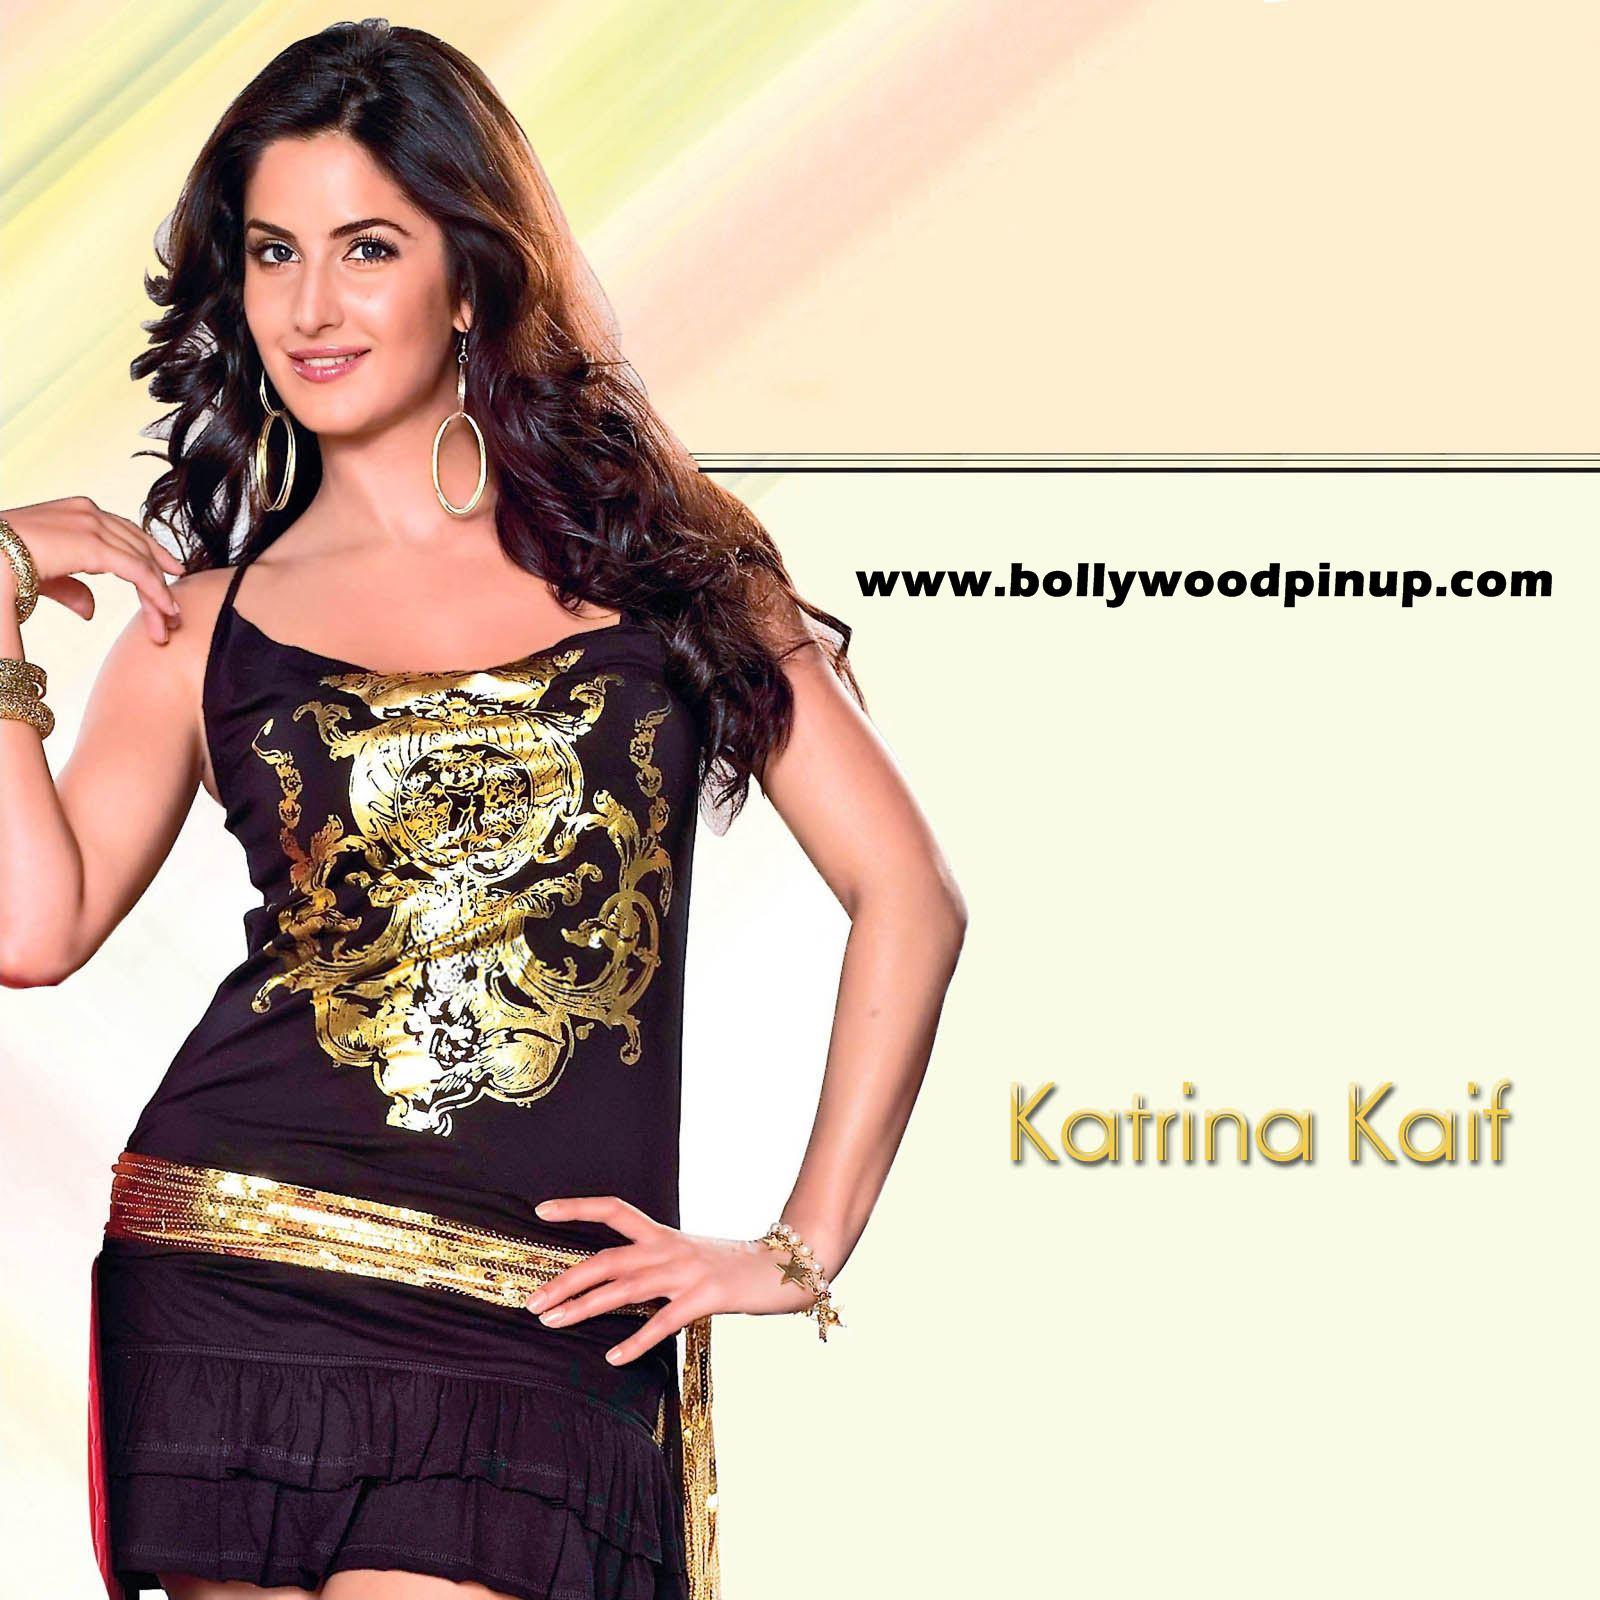 , Katrina Kaif Unseen Wallpaper